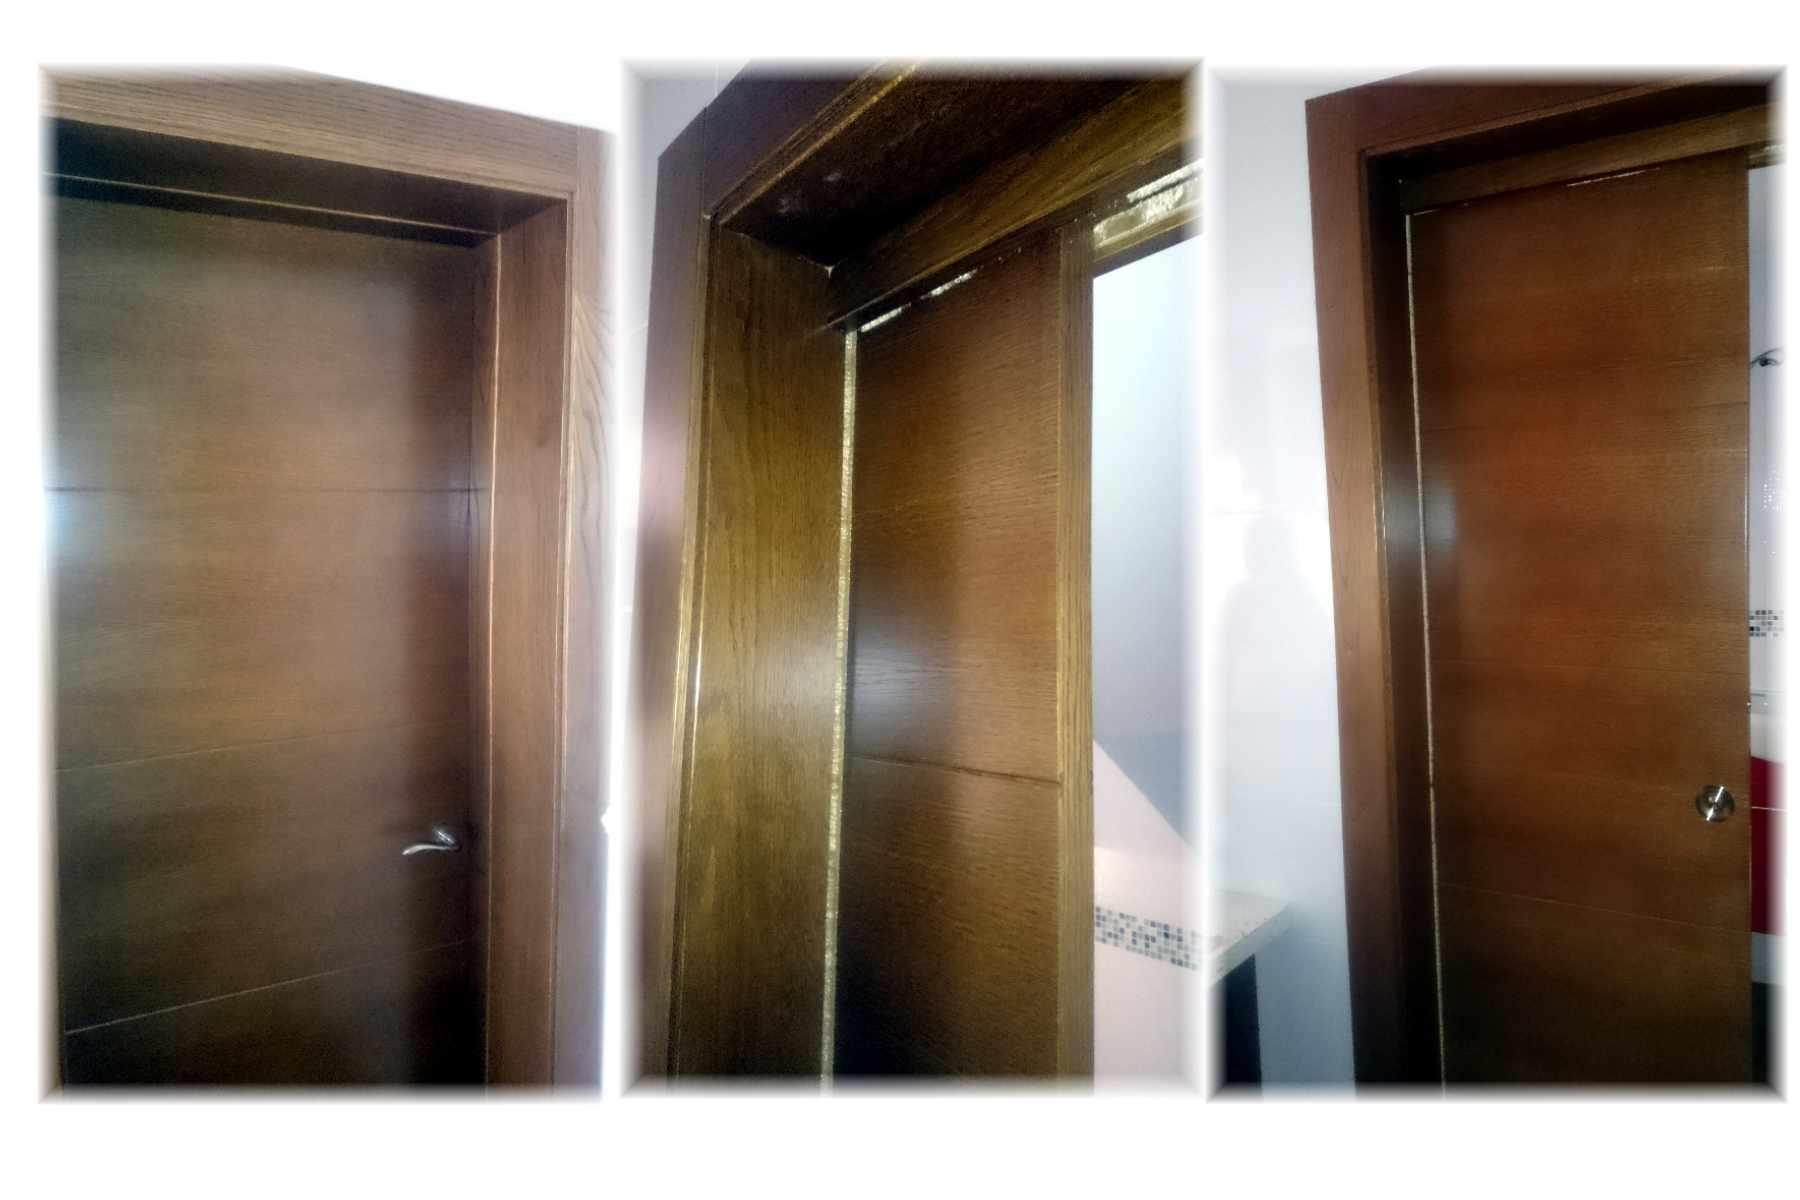 Carpinter a familia murcia puertas de entrada y paso - Carpinteria de aluminio murcia ...